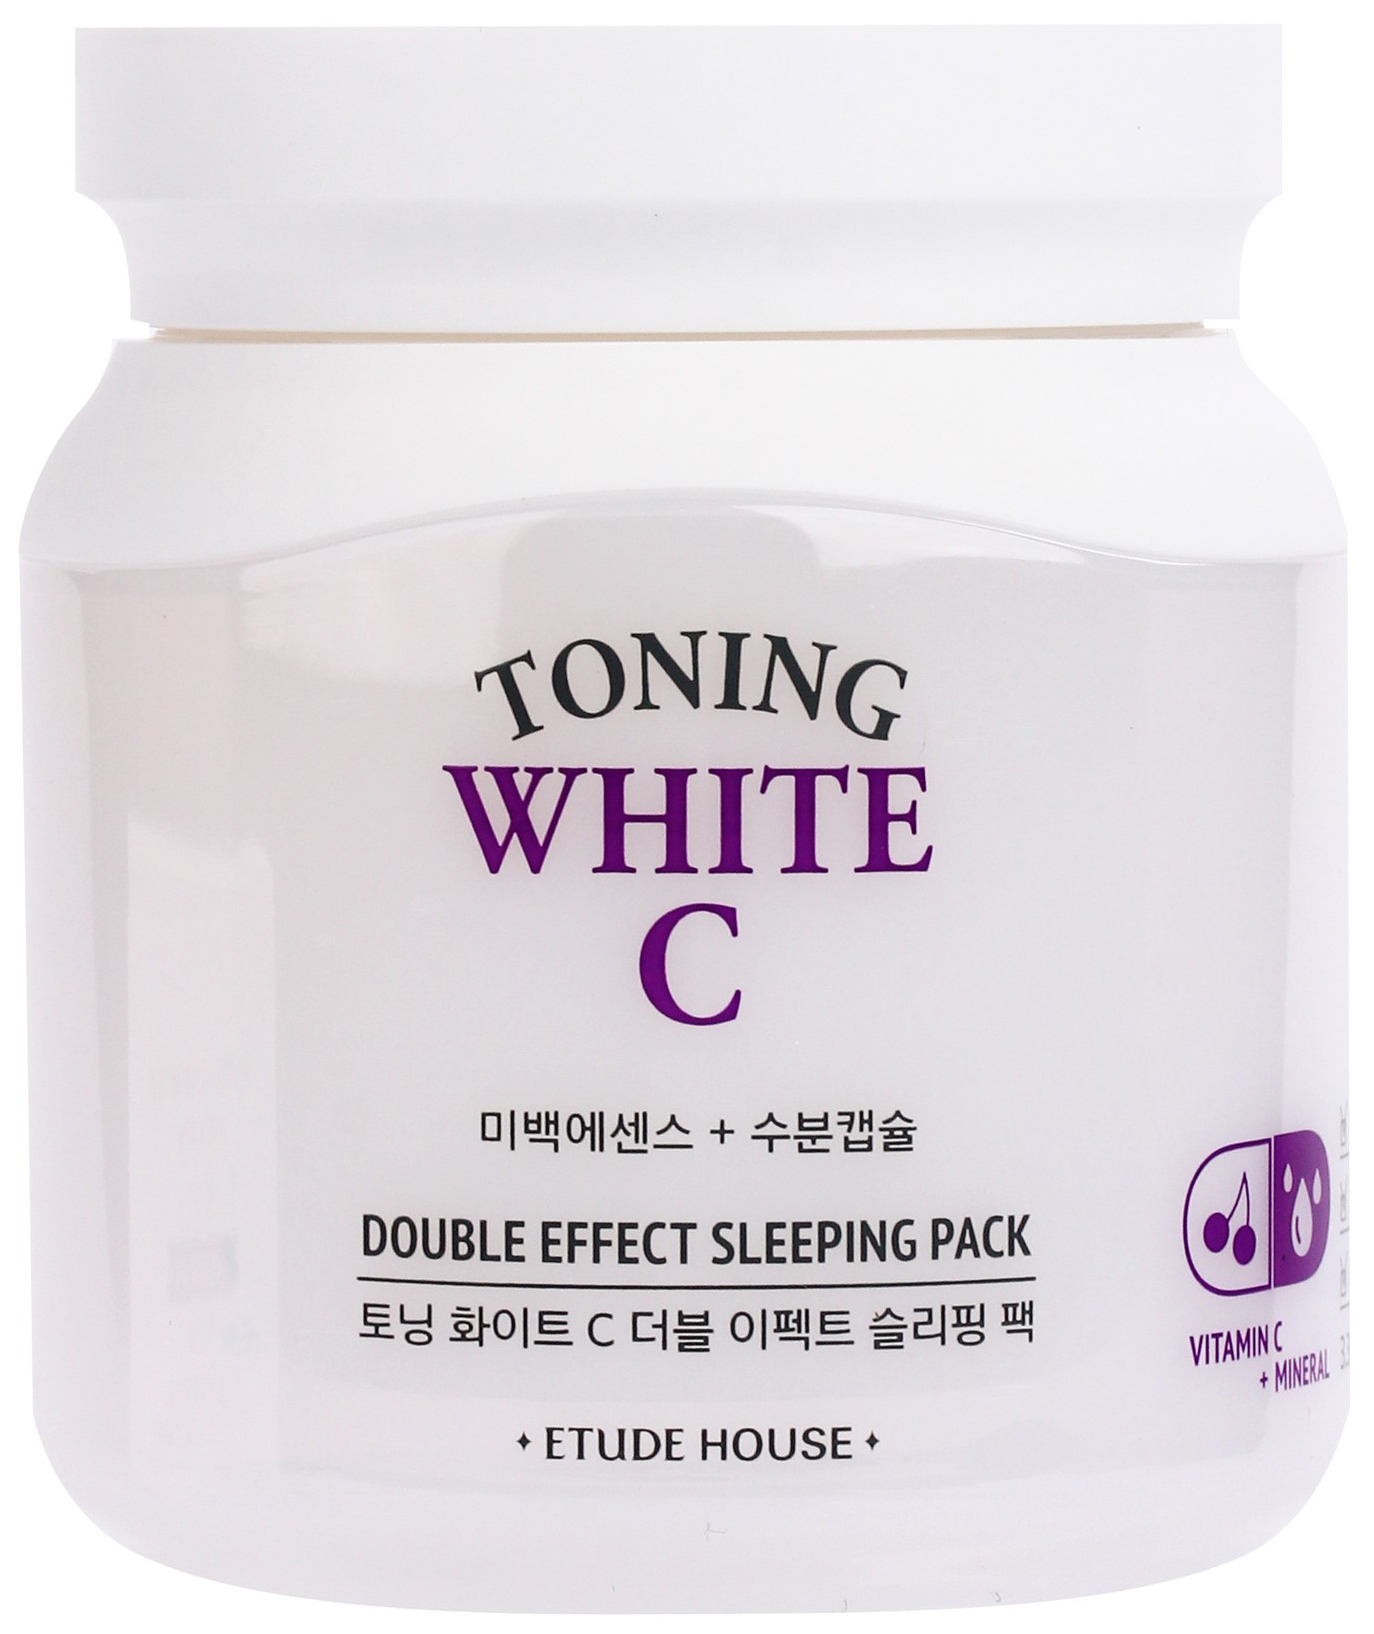 Маска для лица Etude House Toning White C Double Effect Sleeping Pack 100 мл